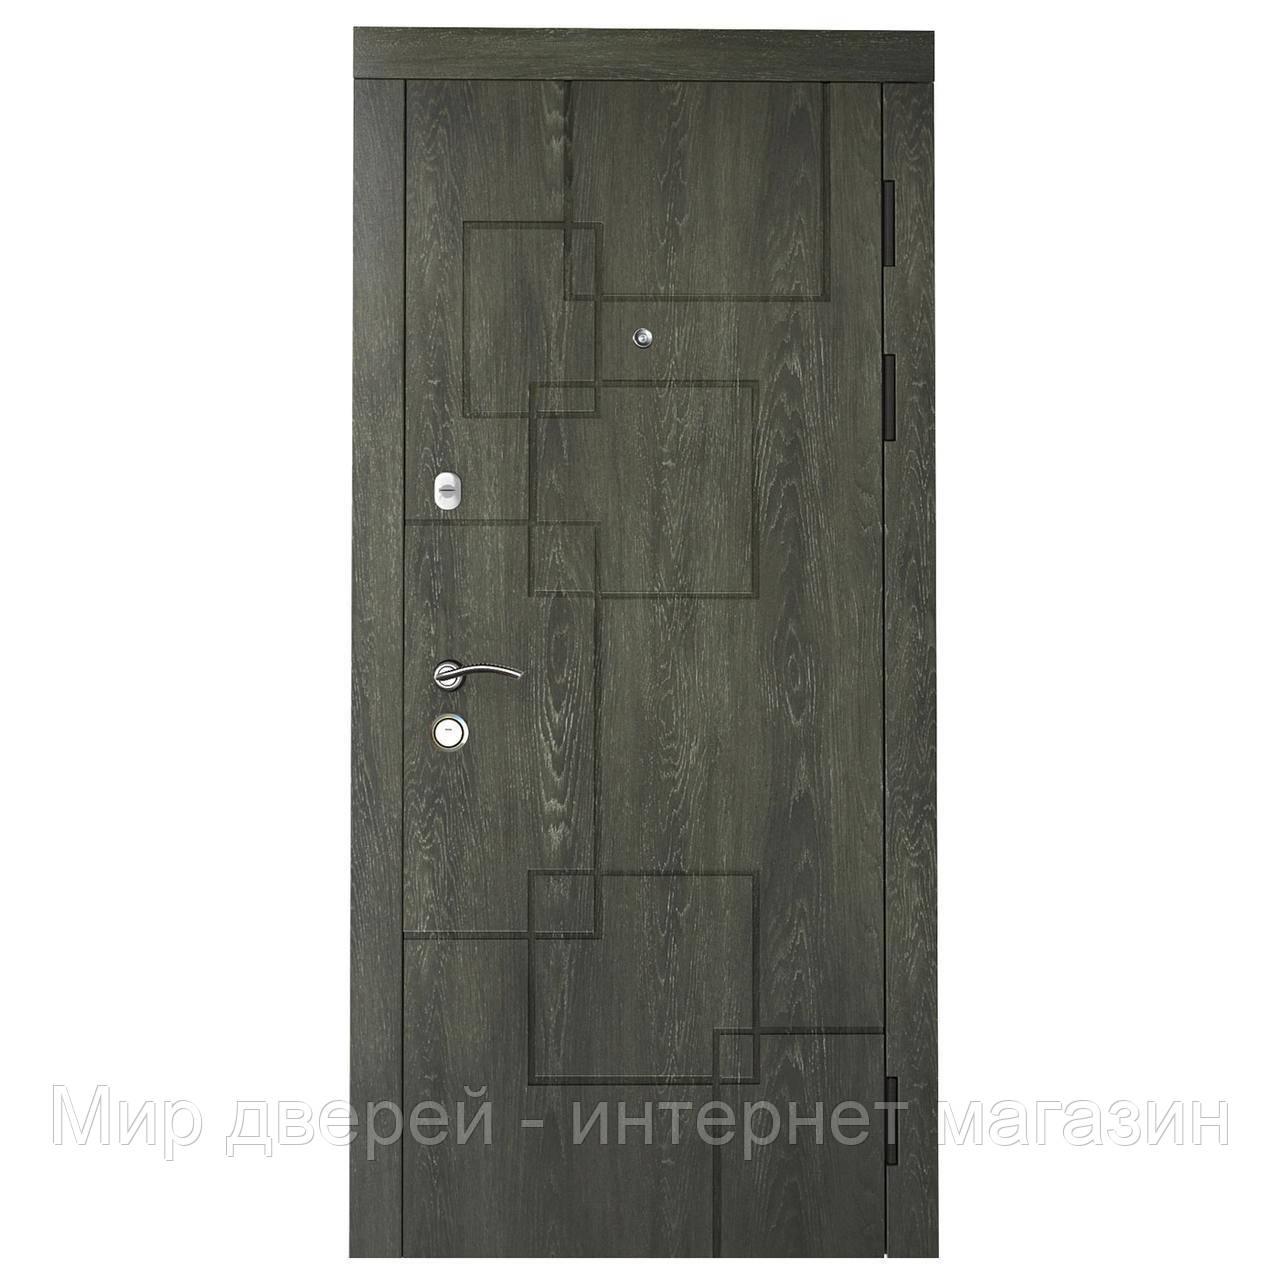 Двери входные KASKAD MODERN Квадро Стандарт 80